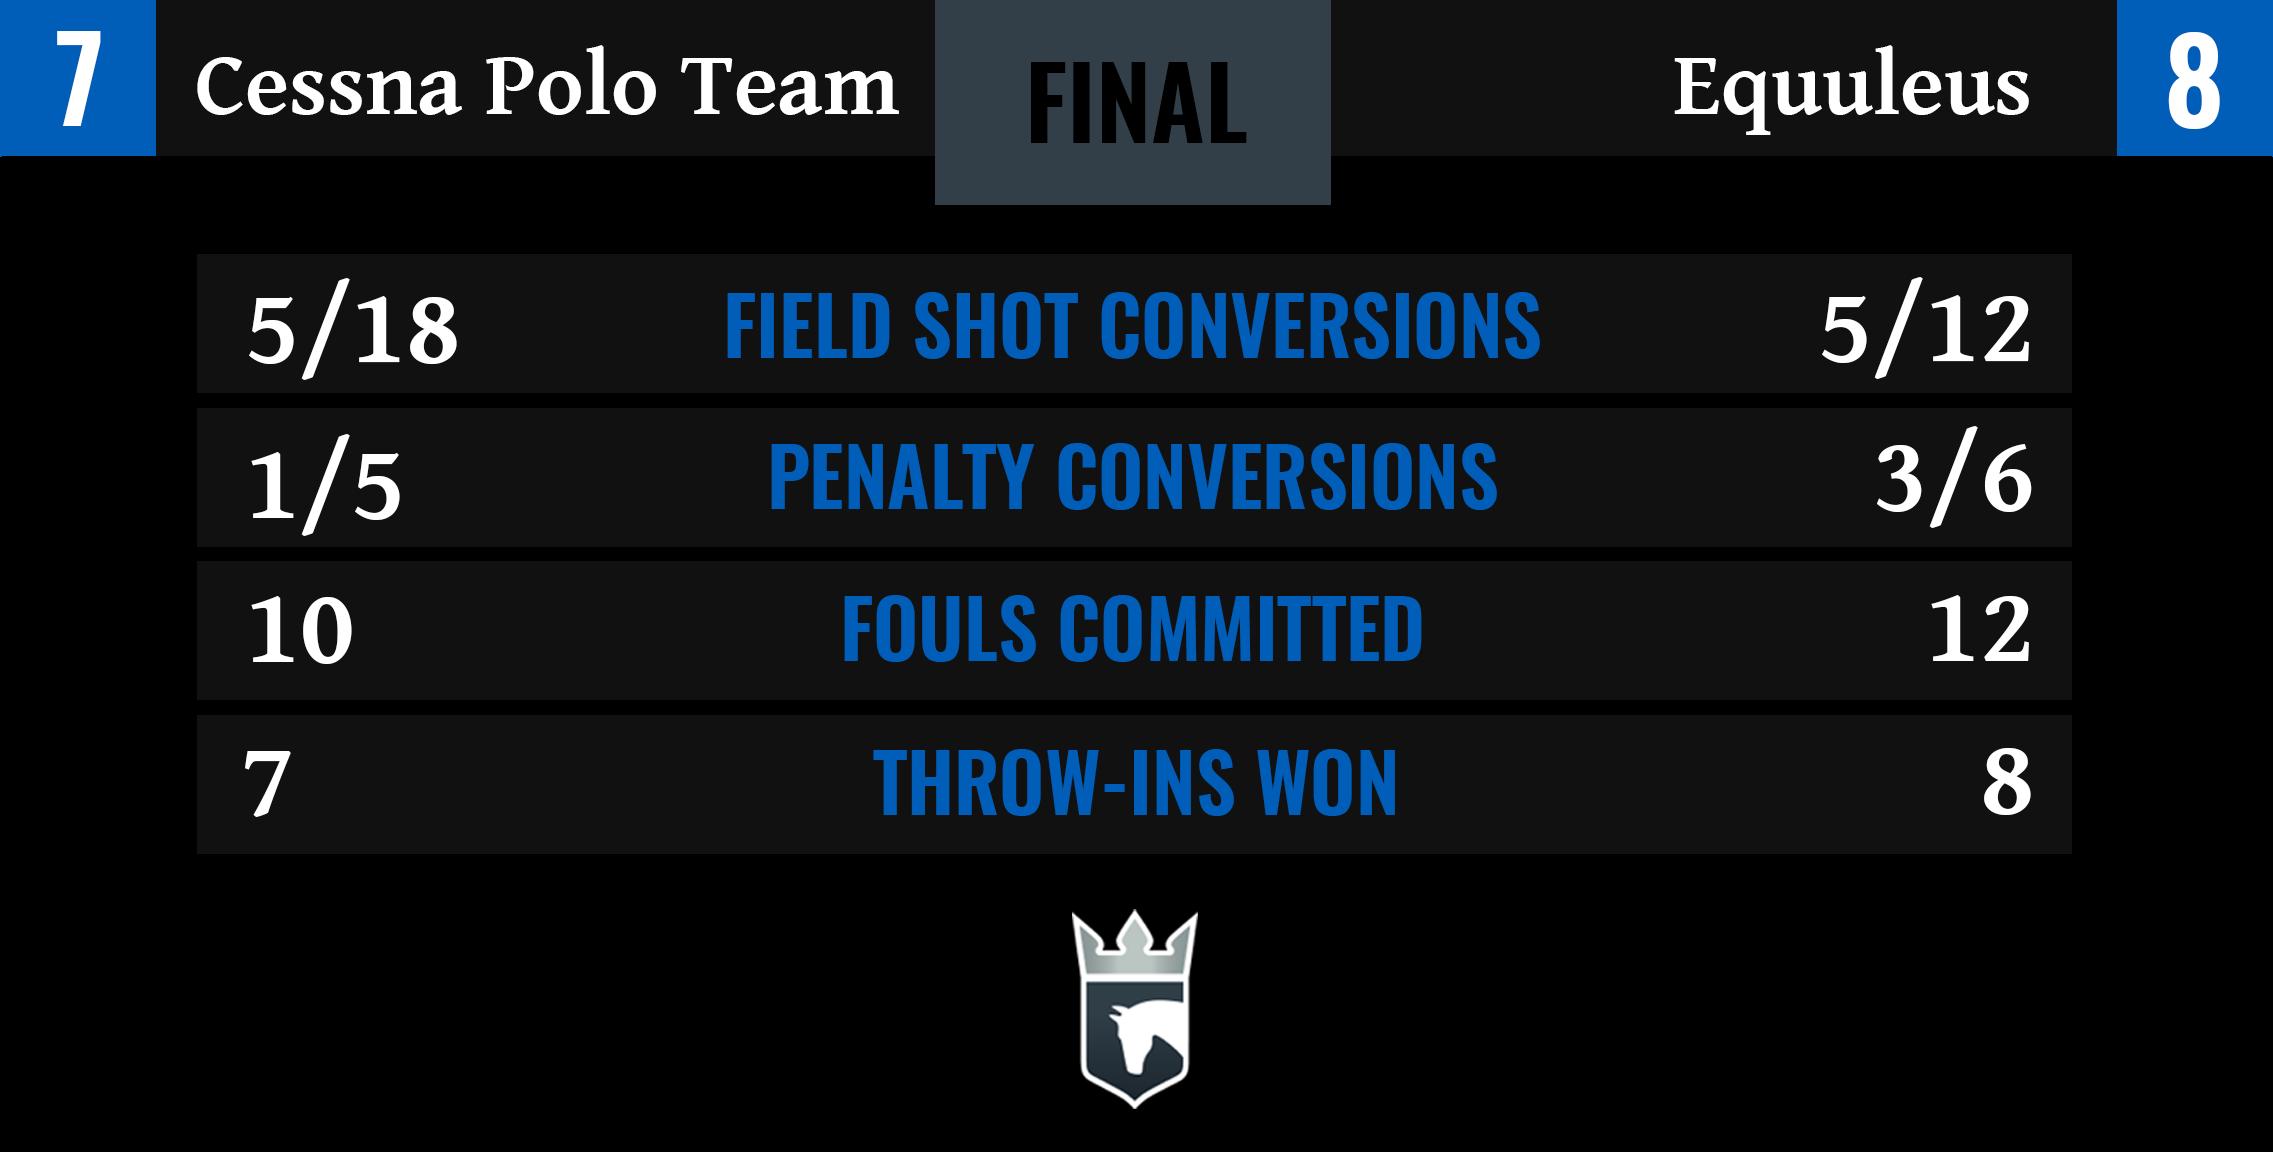 Cessna Polo Team vs Equuleus Final Stats